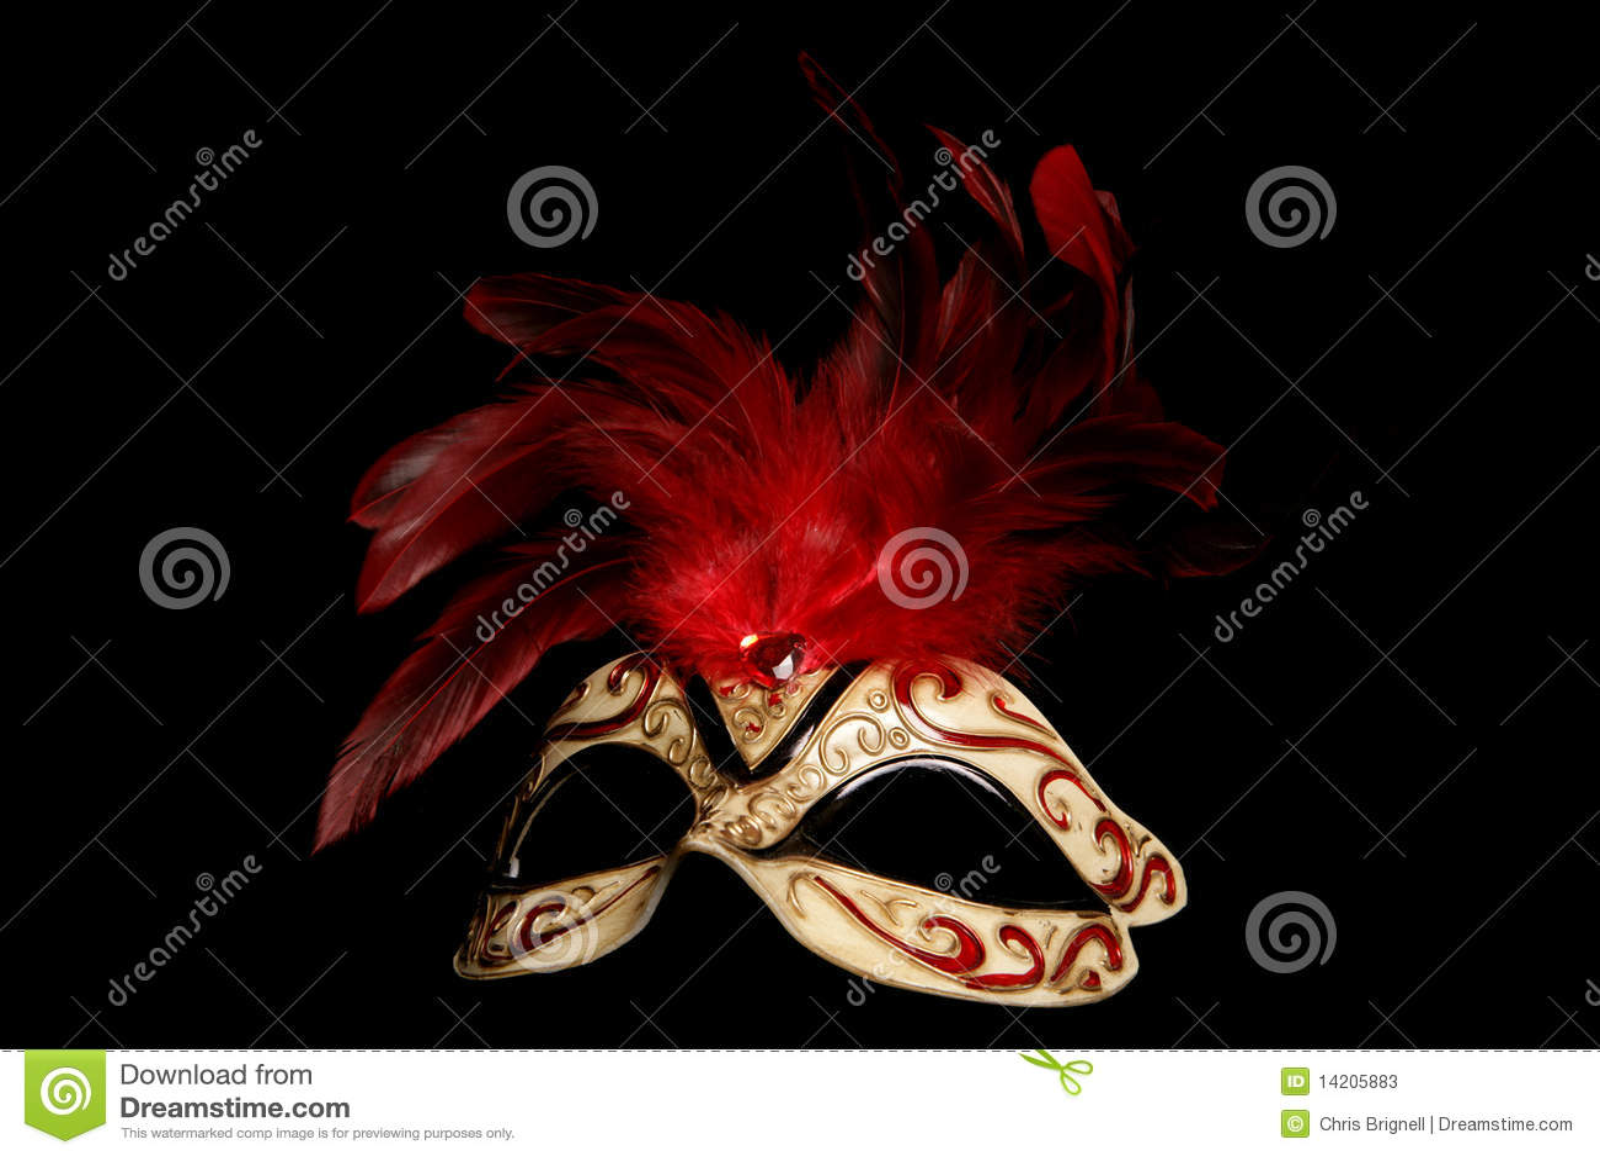 masquerade mask black background wallpaper - photo #32